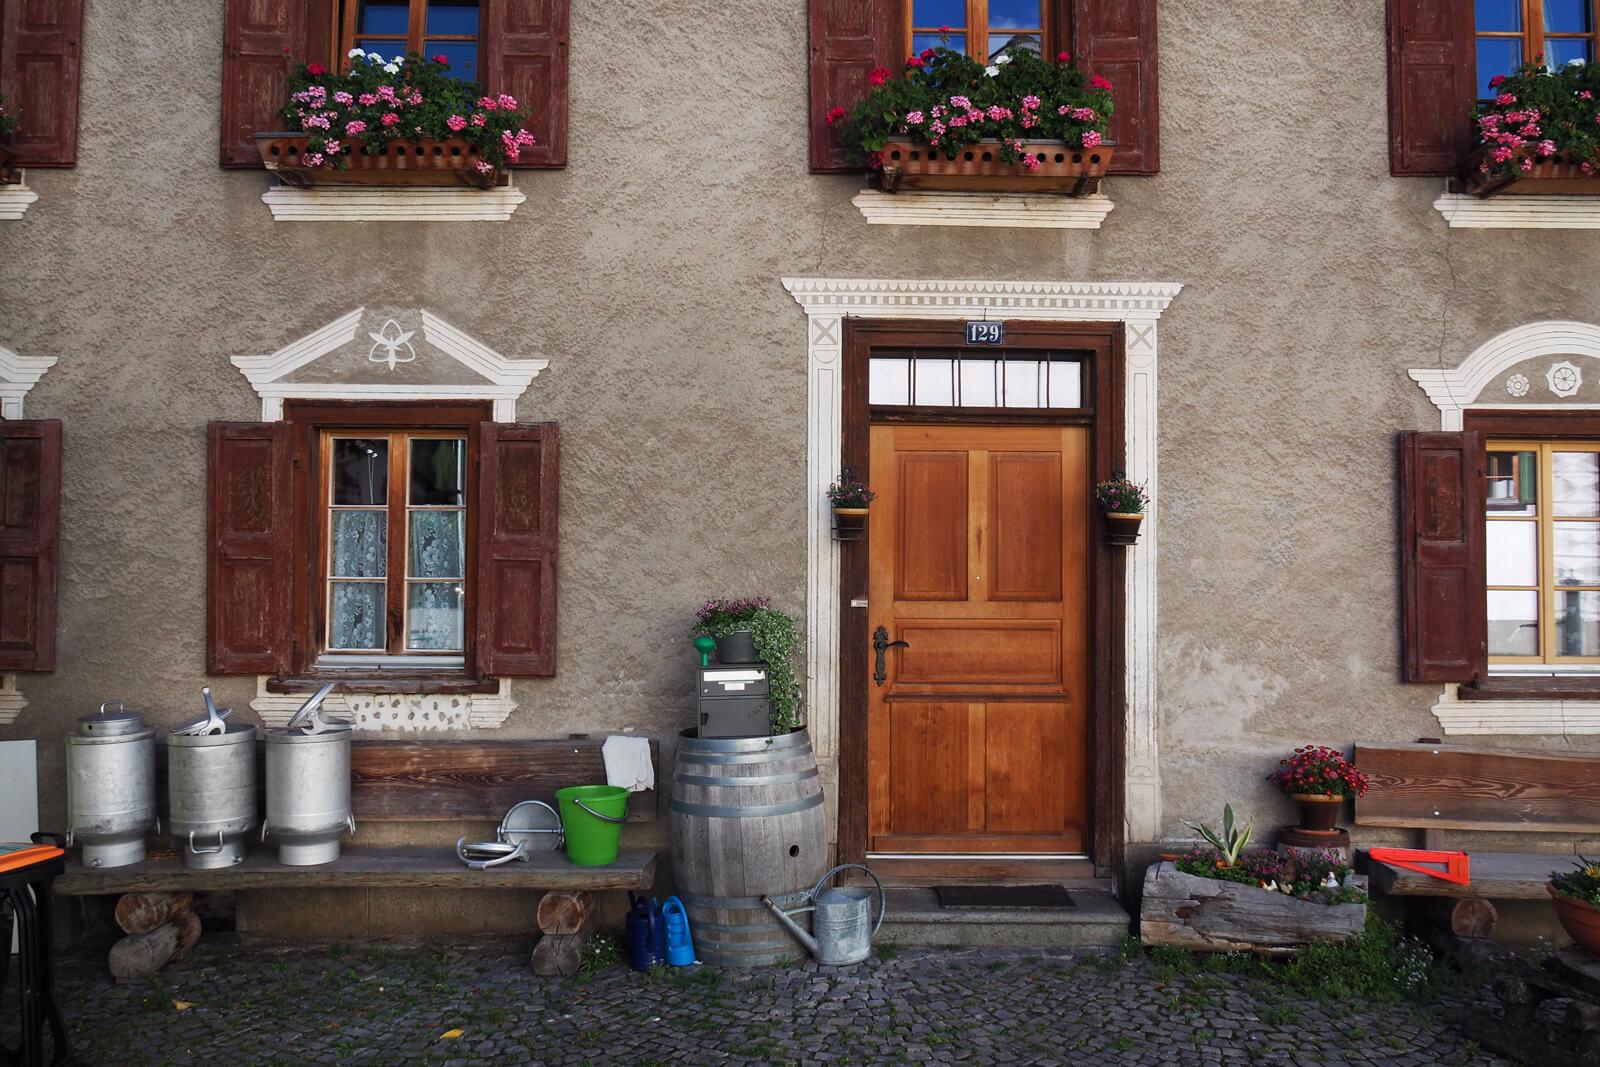 Residential Home in Bergün, Switzerland